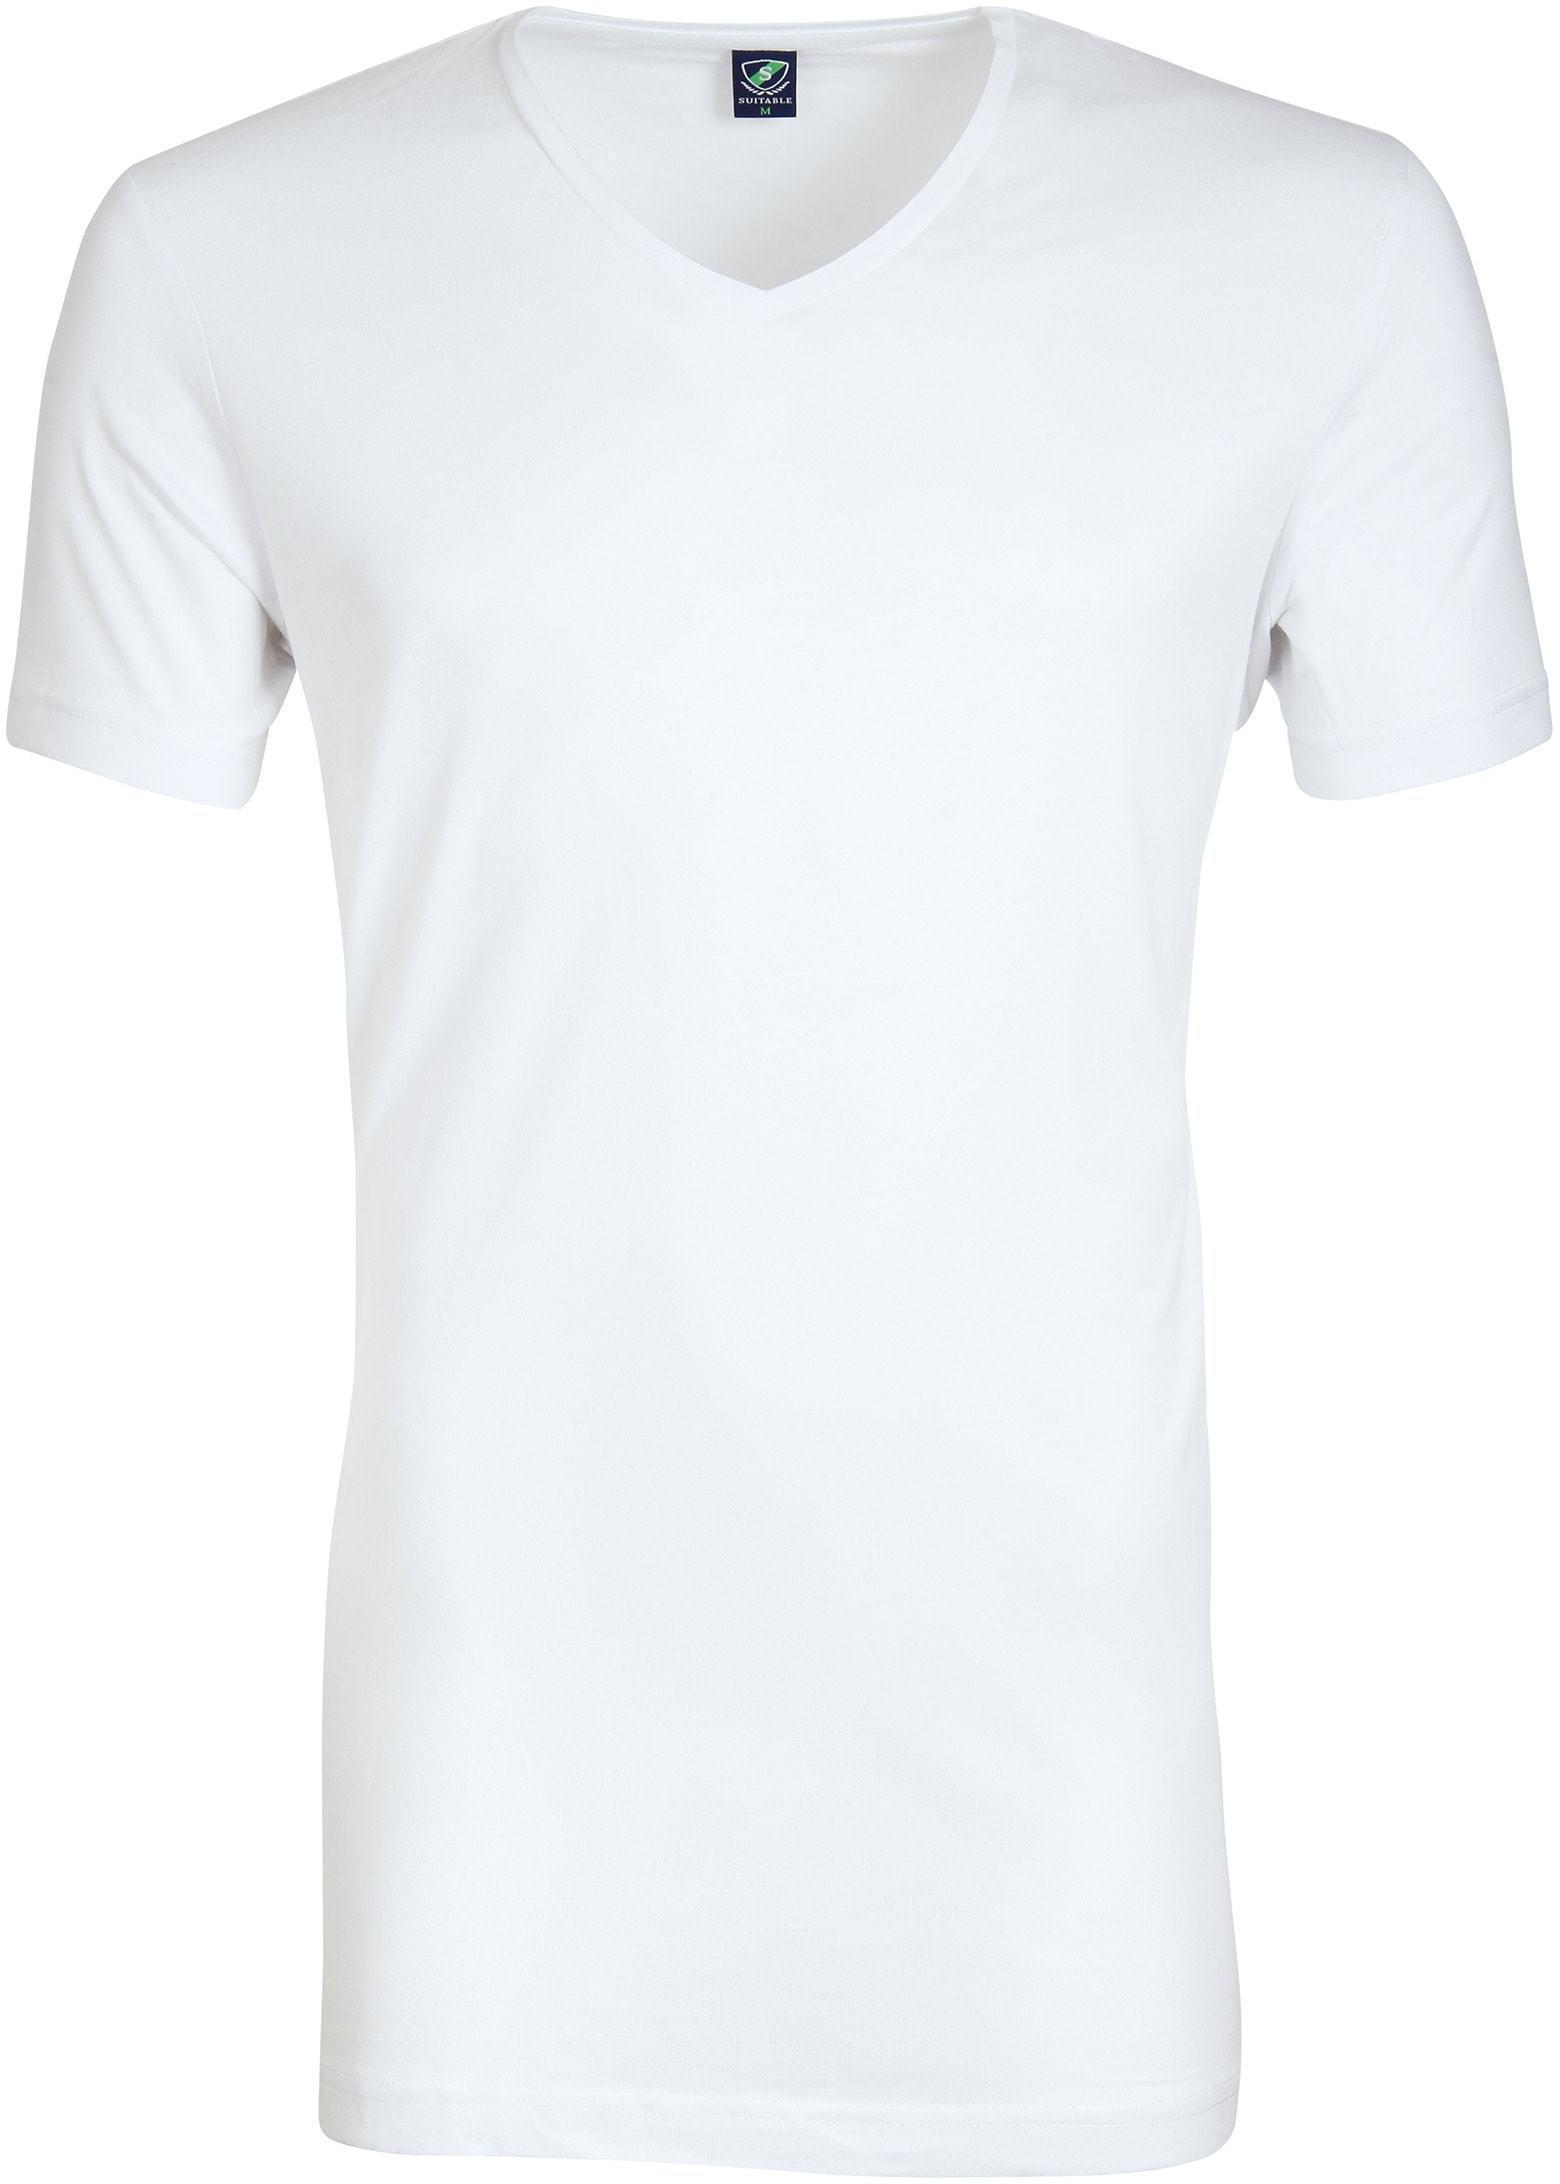 V-Neck 6-Pack Bamboo T-shirts foto 1